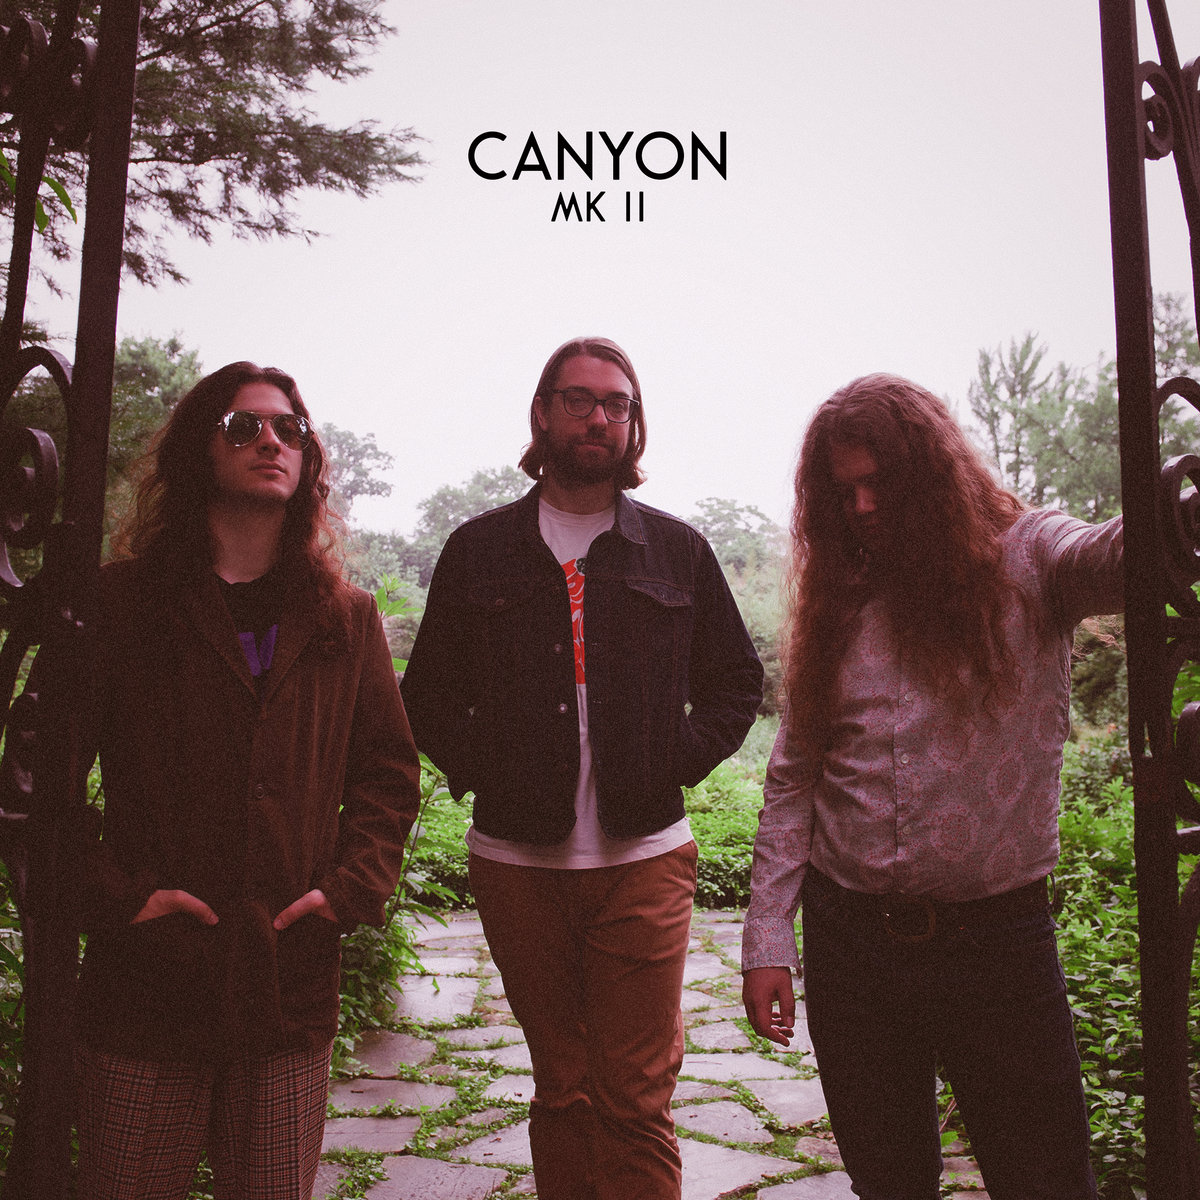 canyon mk ii